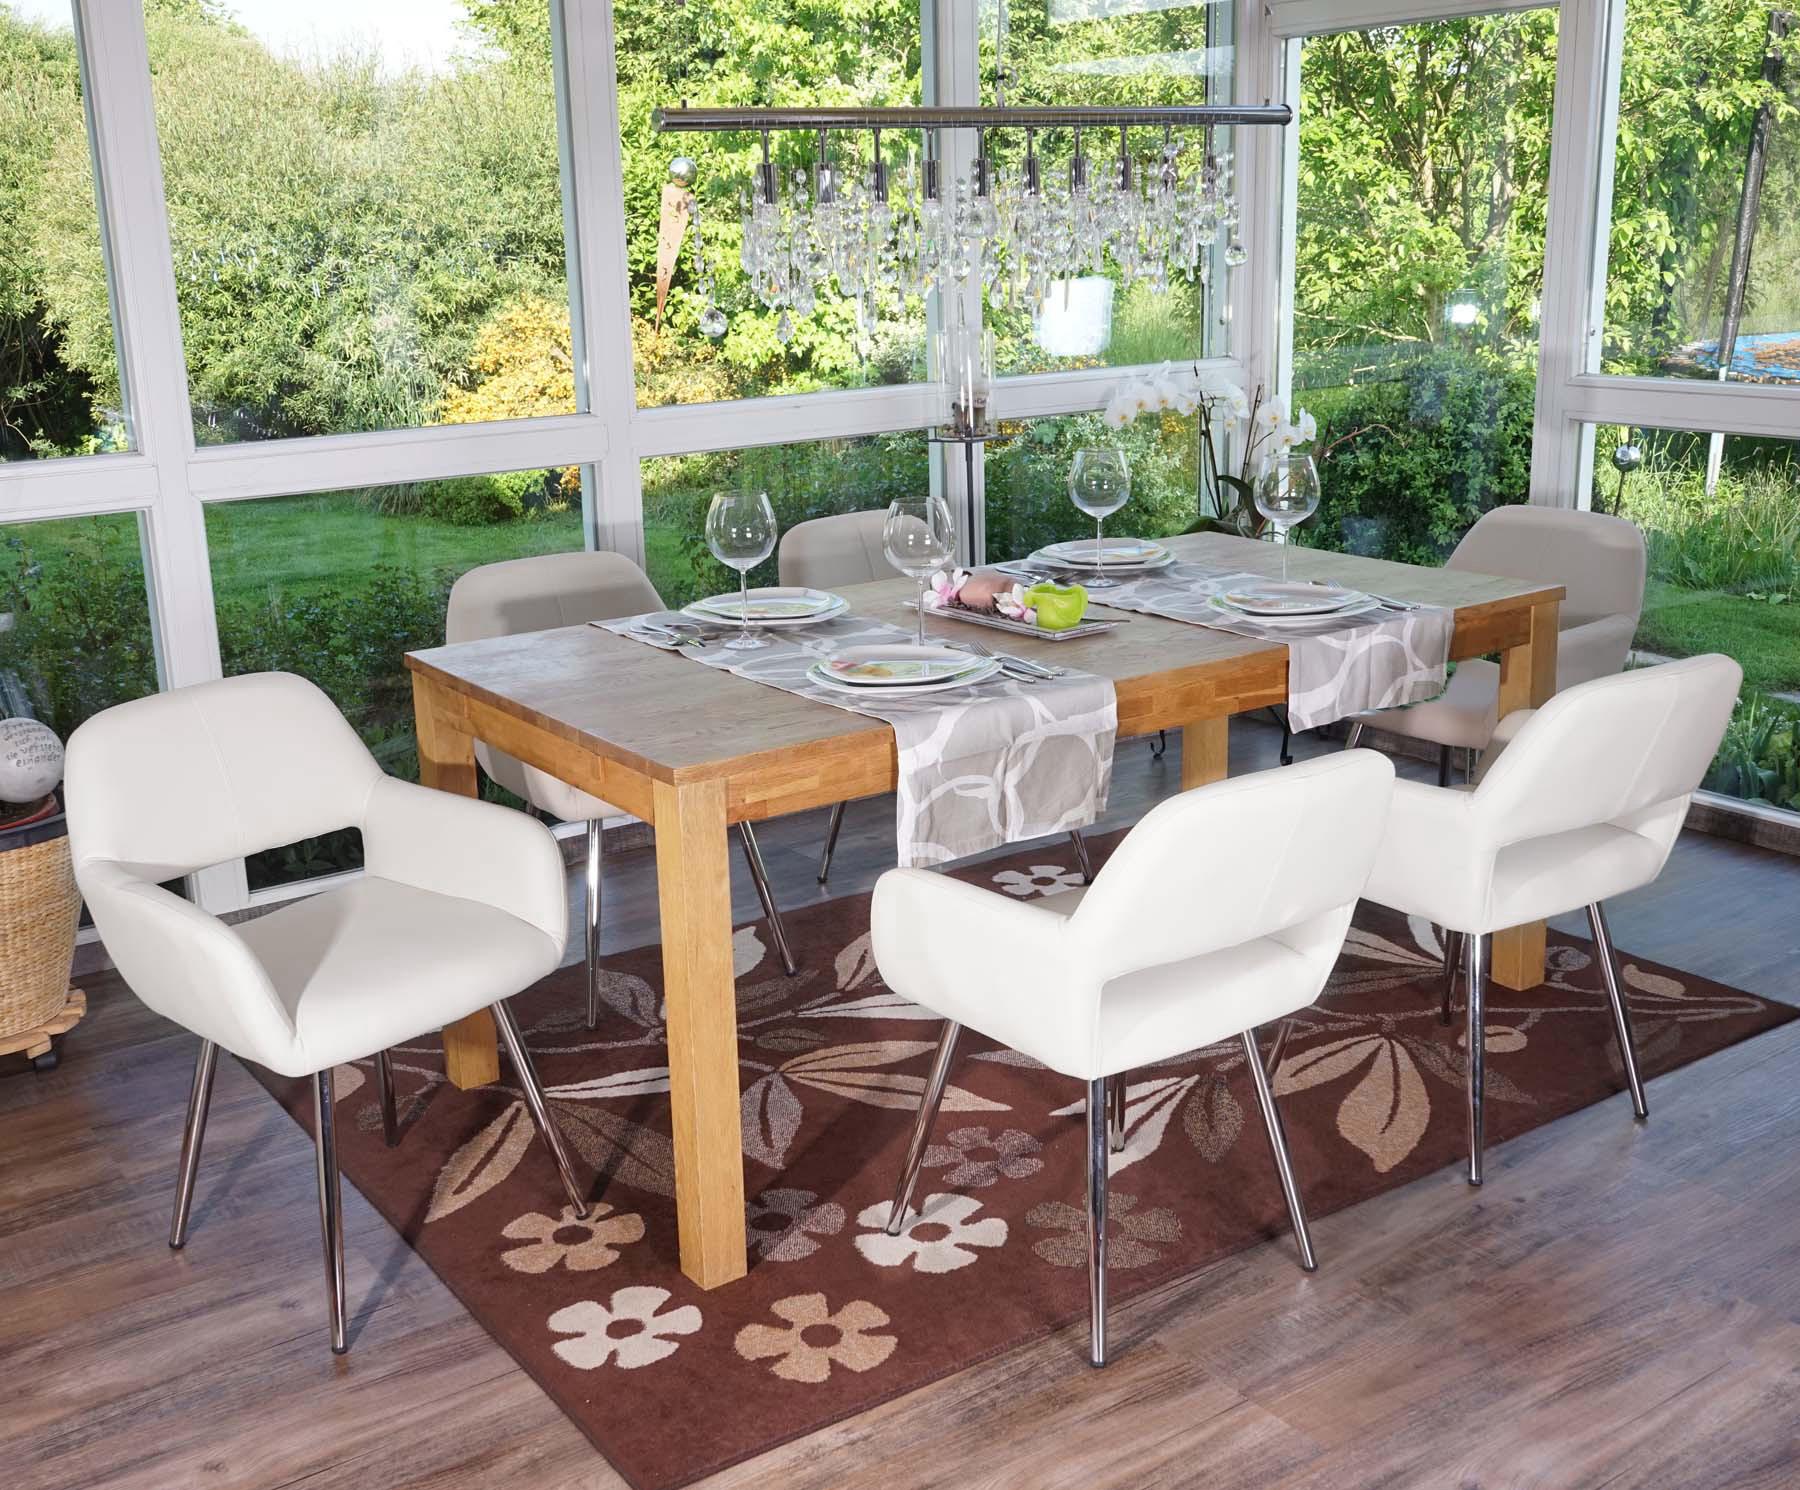 Sedie Sala Da Pranzo Ecopelle : Set sedie lounge hwc a design moderno ecopelle sala pranzo